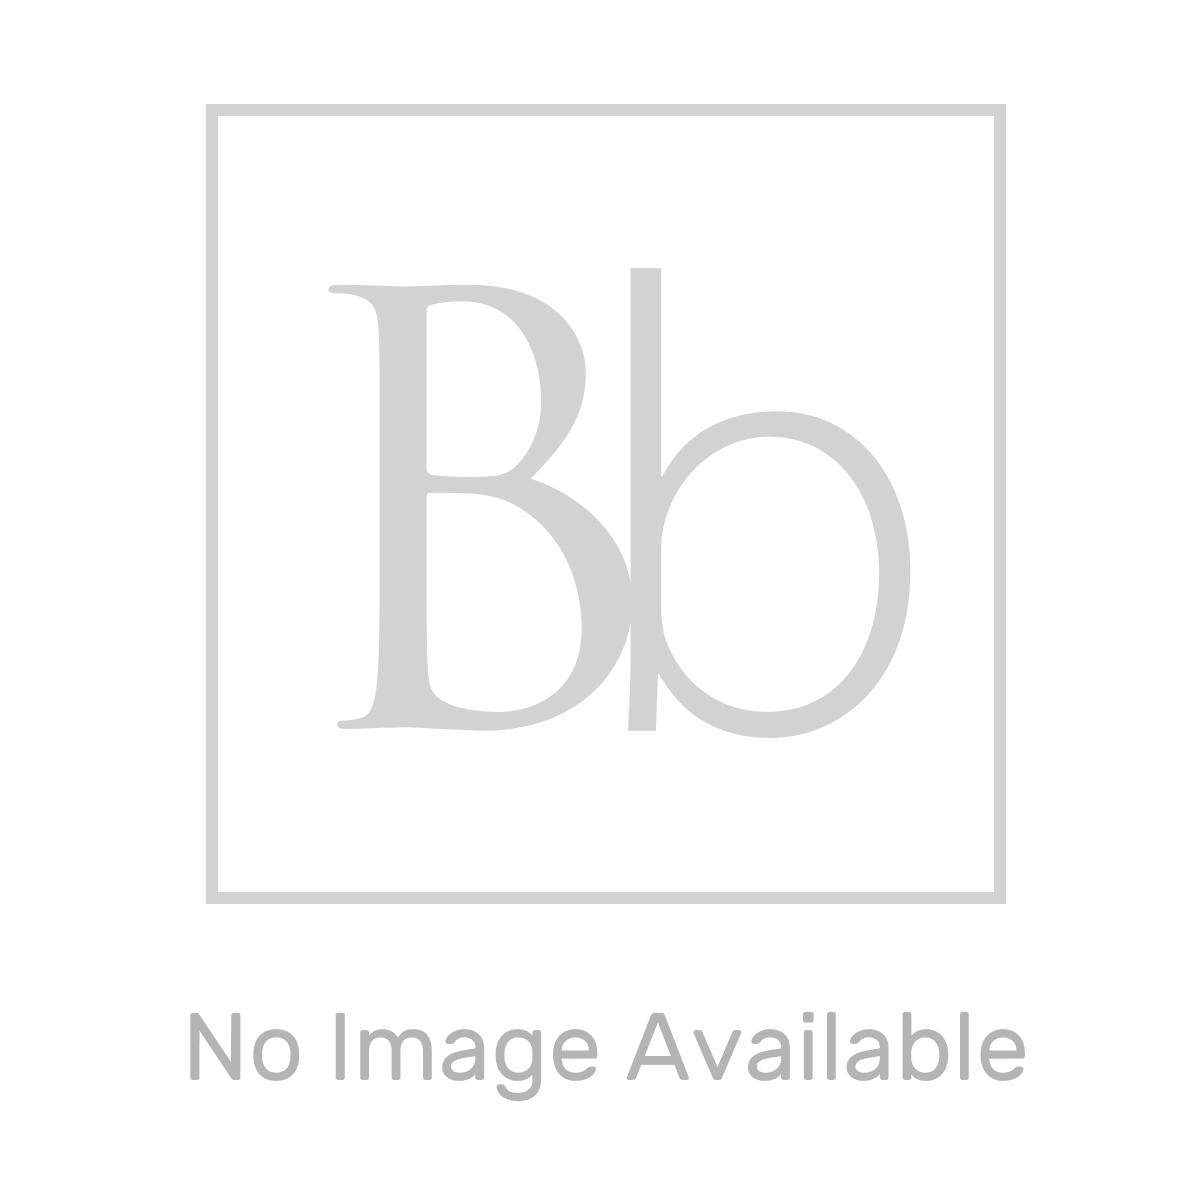 Frontline Aquaglass Velar+ Black Horizontal Crittal Framed Walk In Shower Enclosure